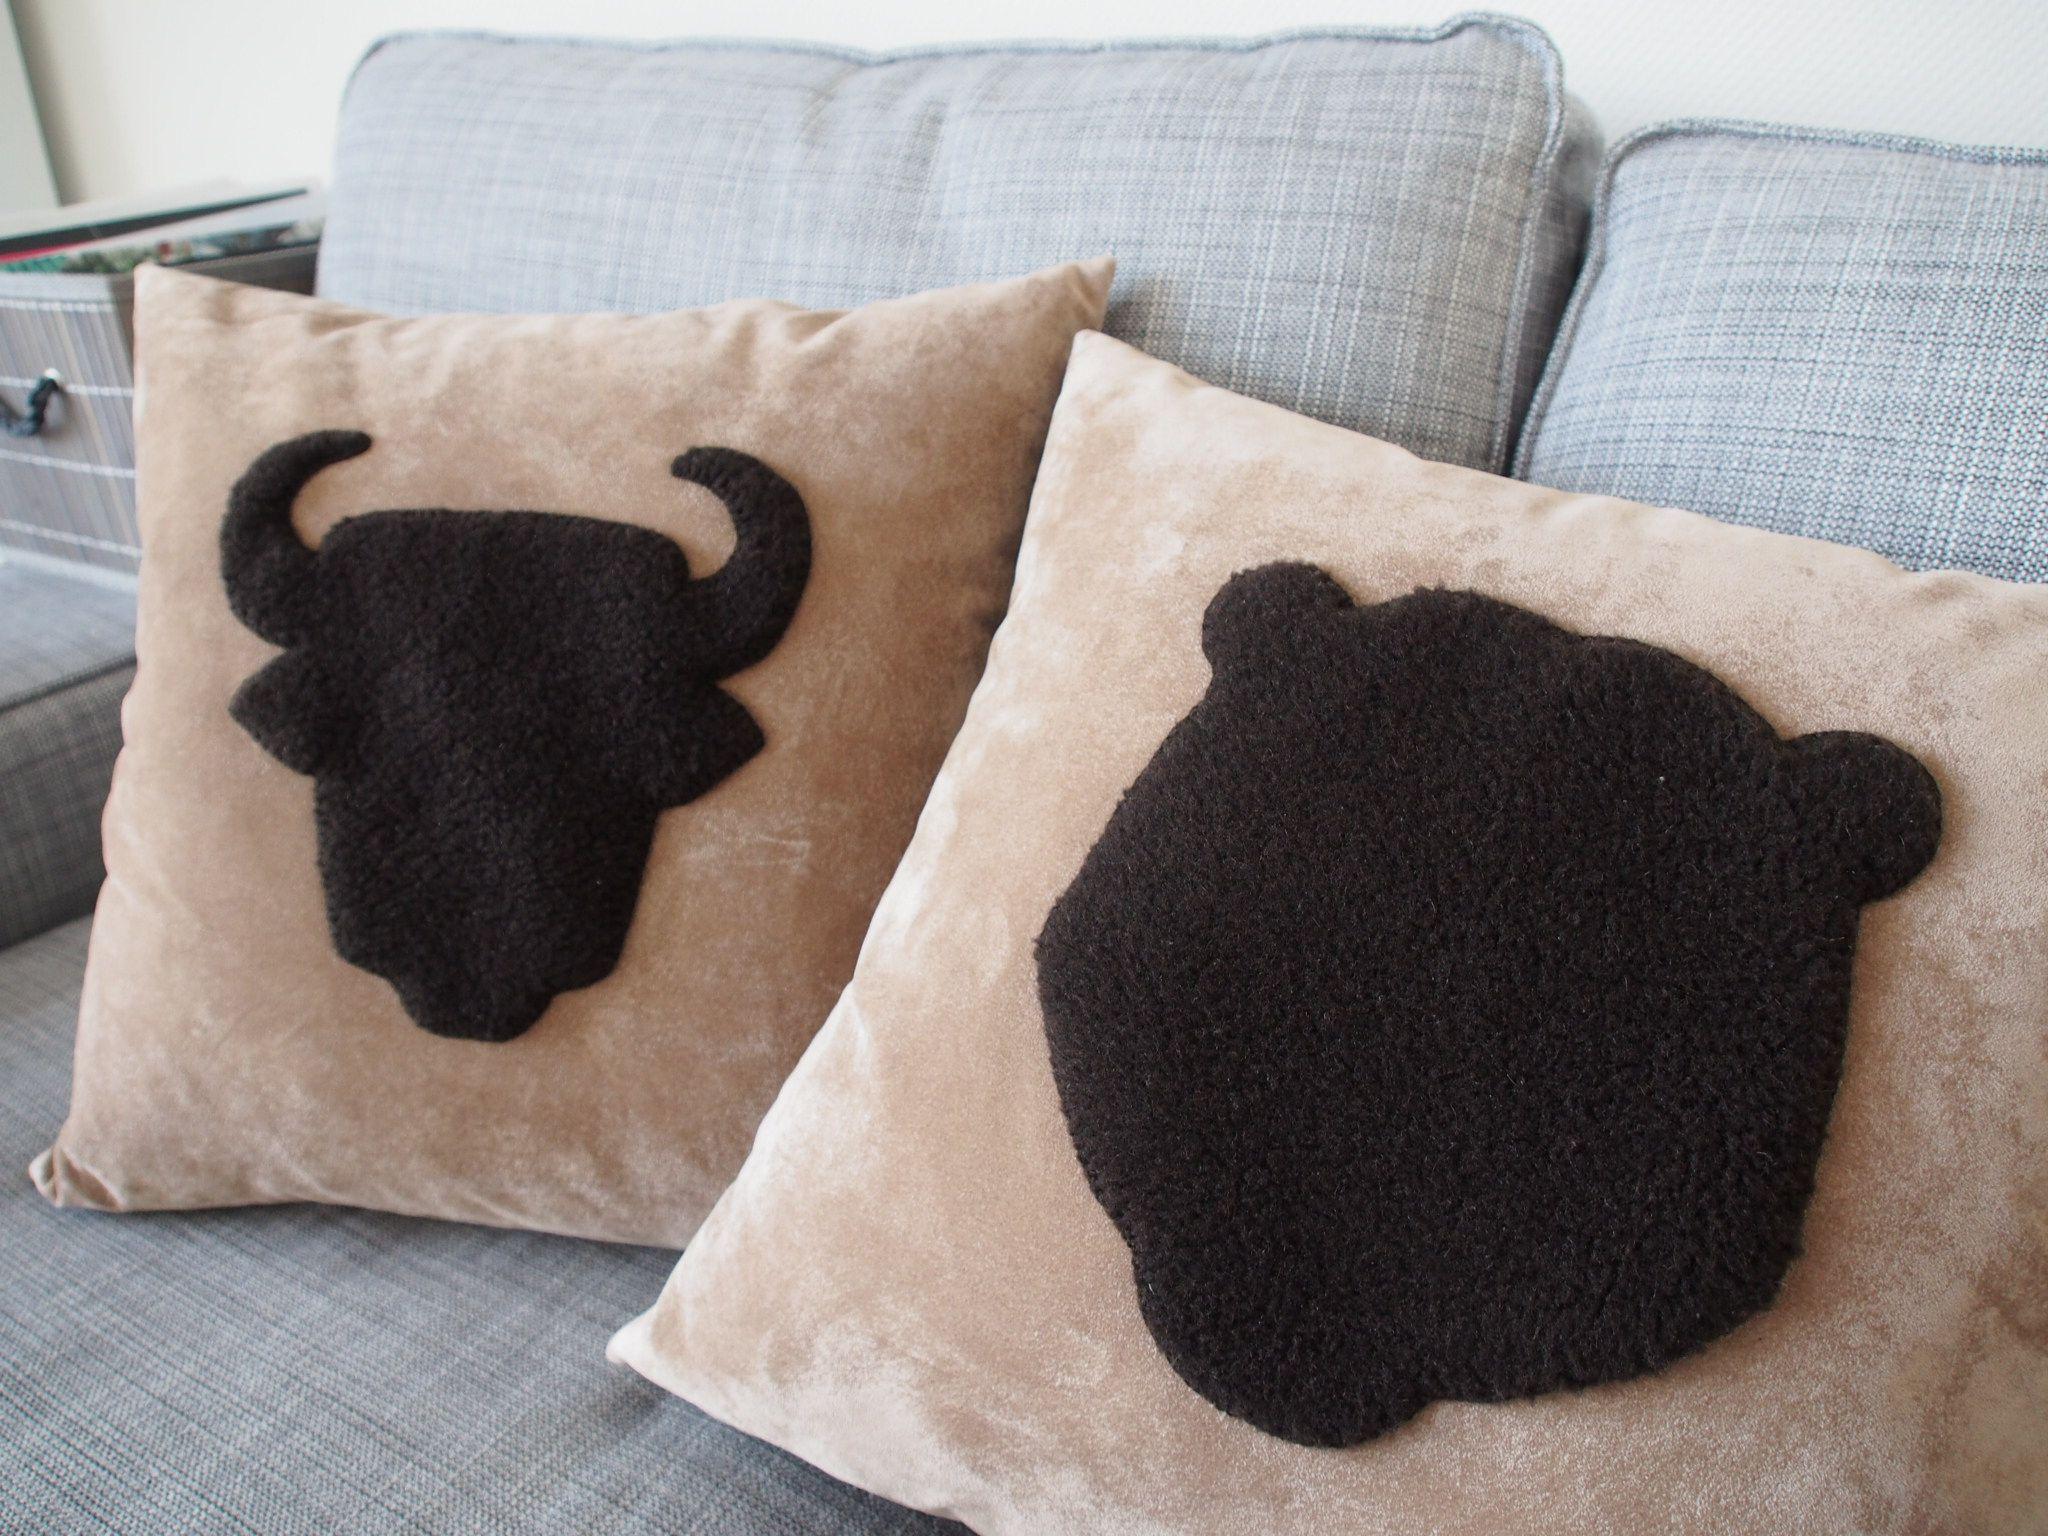 DYI handmade cushion covers #cushions #interior #handmade